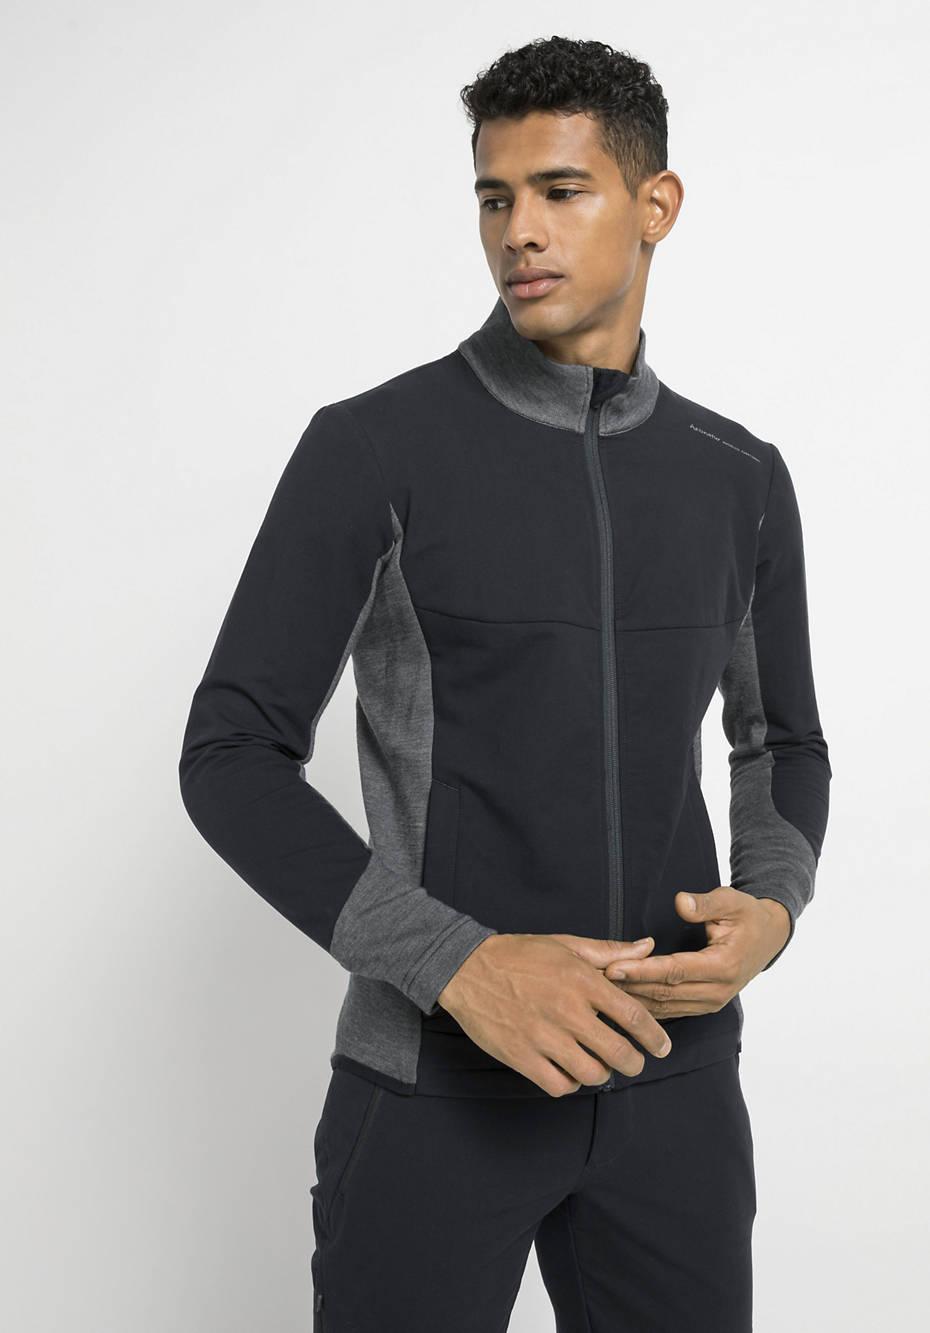 Softshell hybrid jacket made of organic cotton with organic merino wool